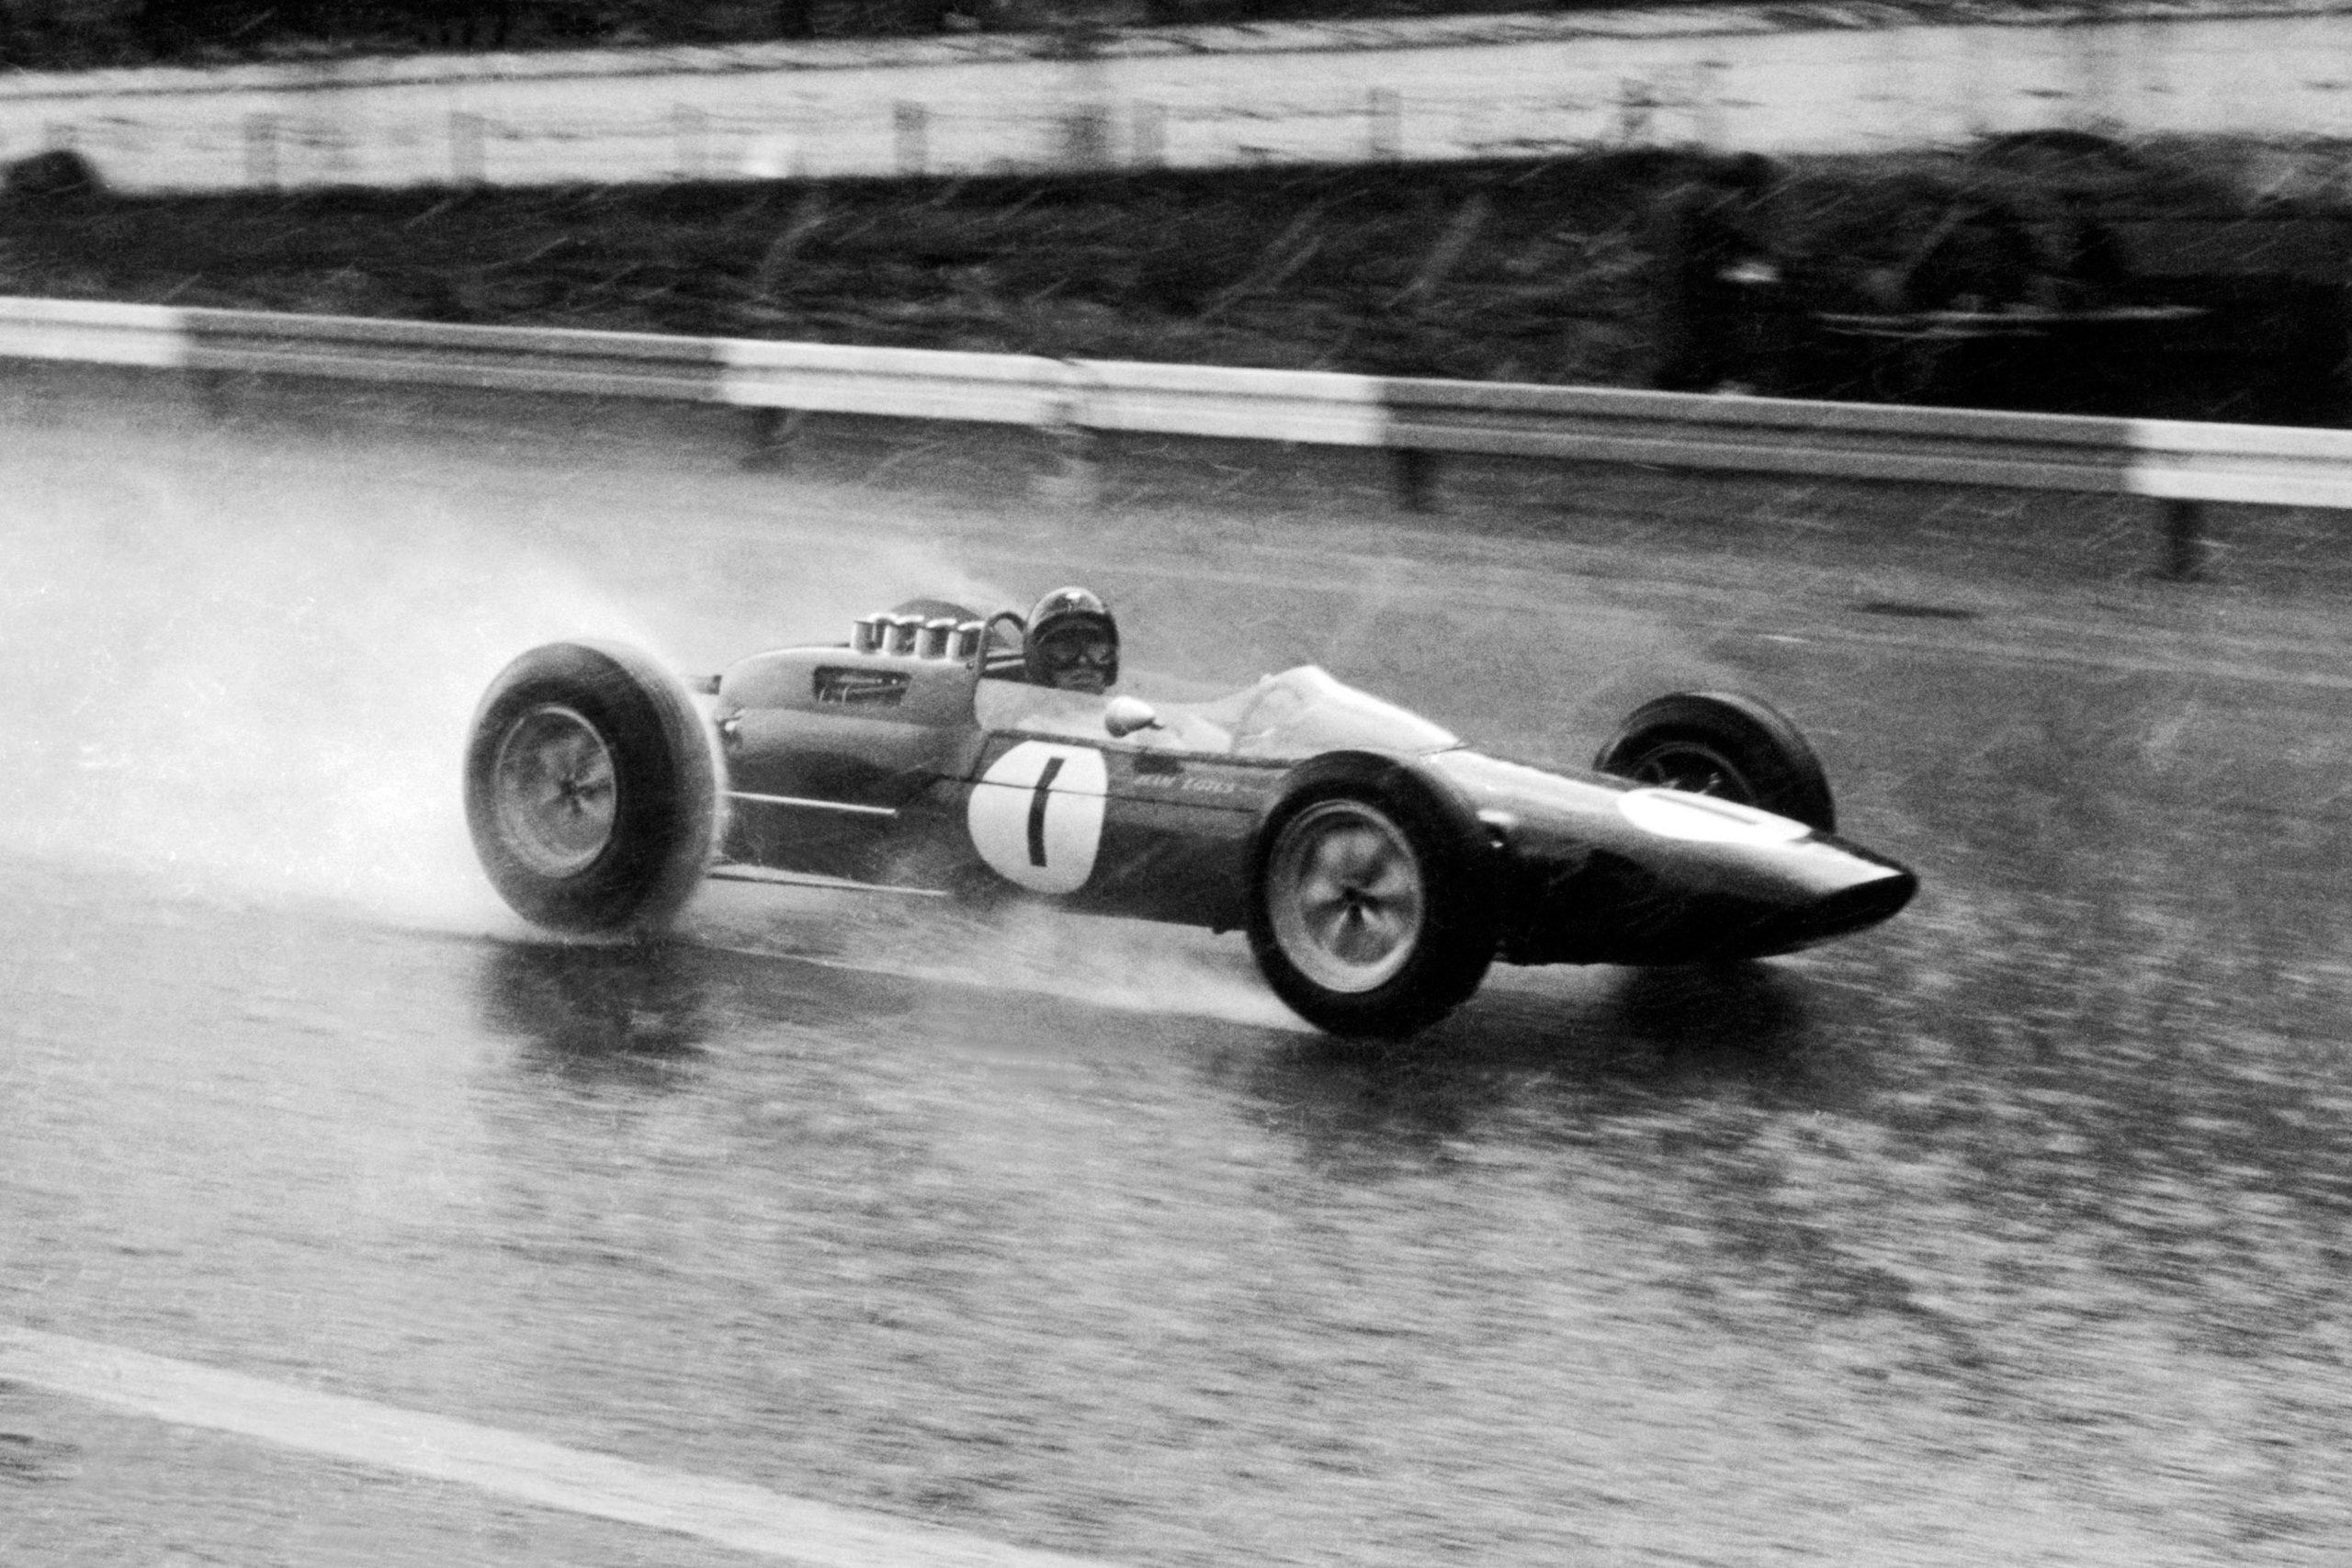 Jim Clark pressing on through the rain in his Lotus 25-Climax.